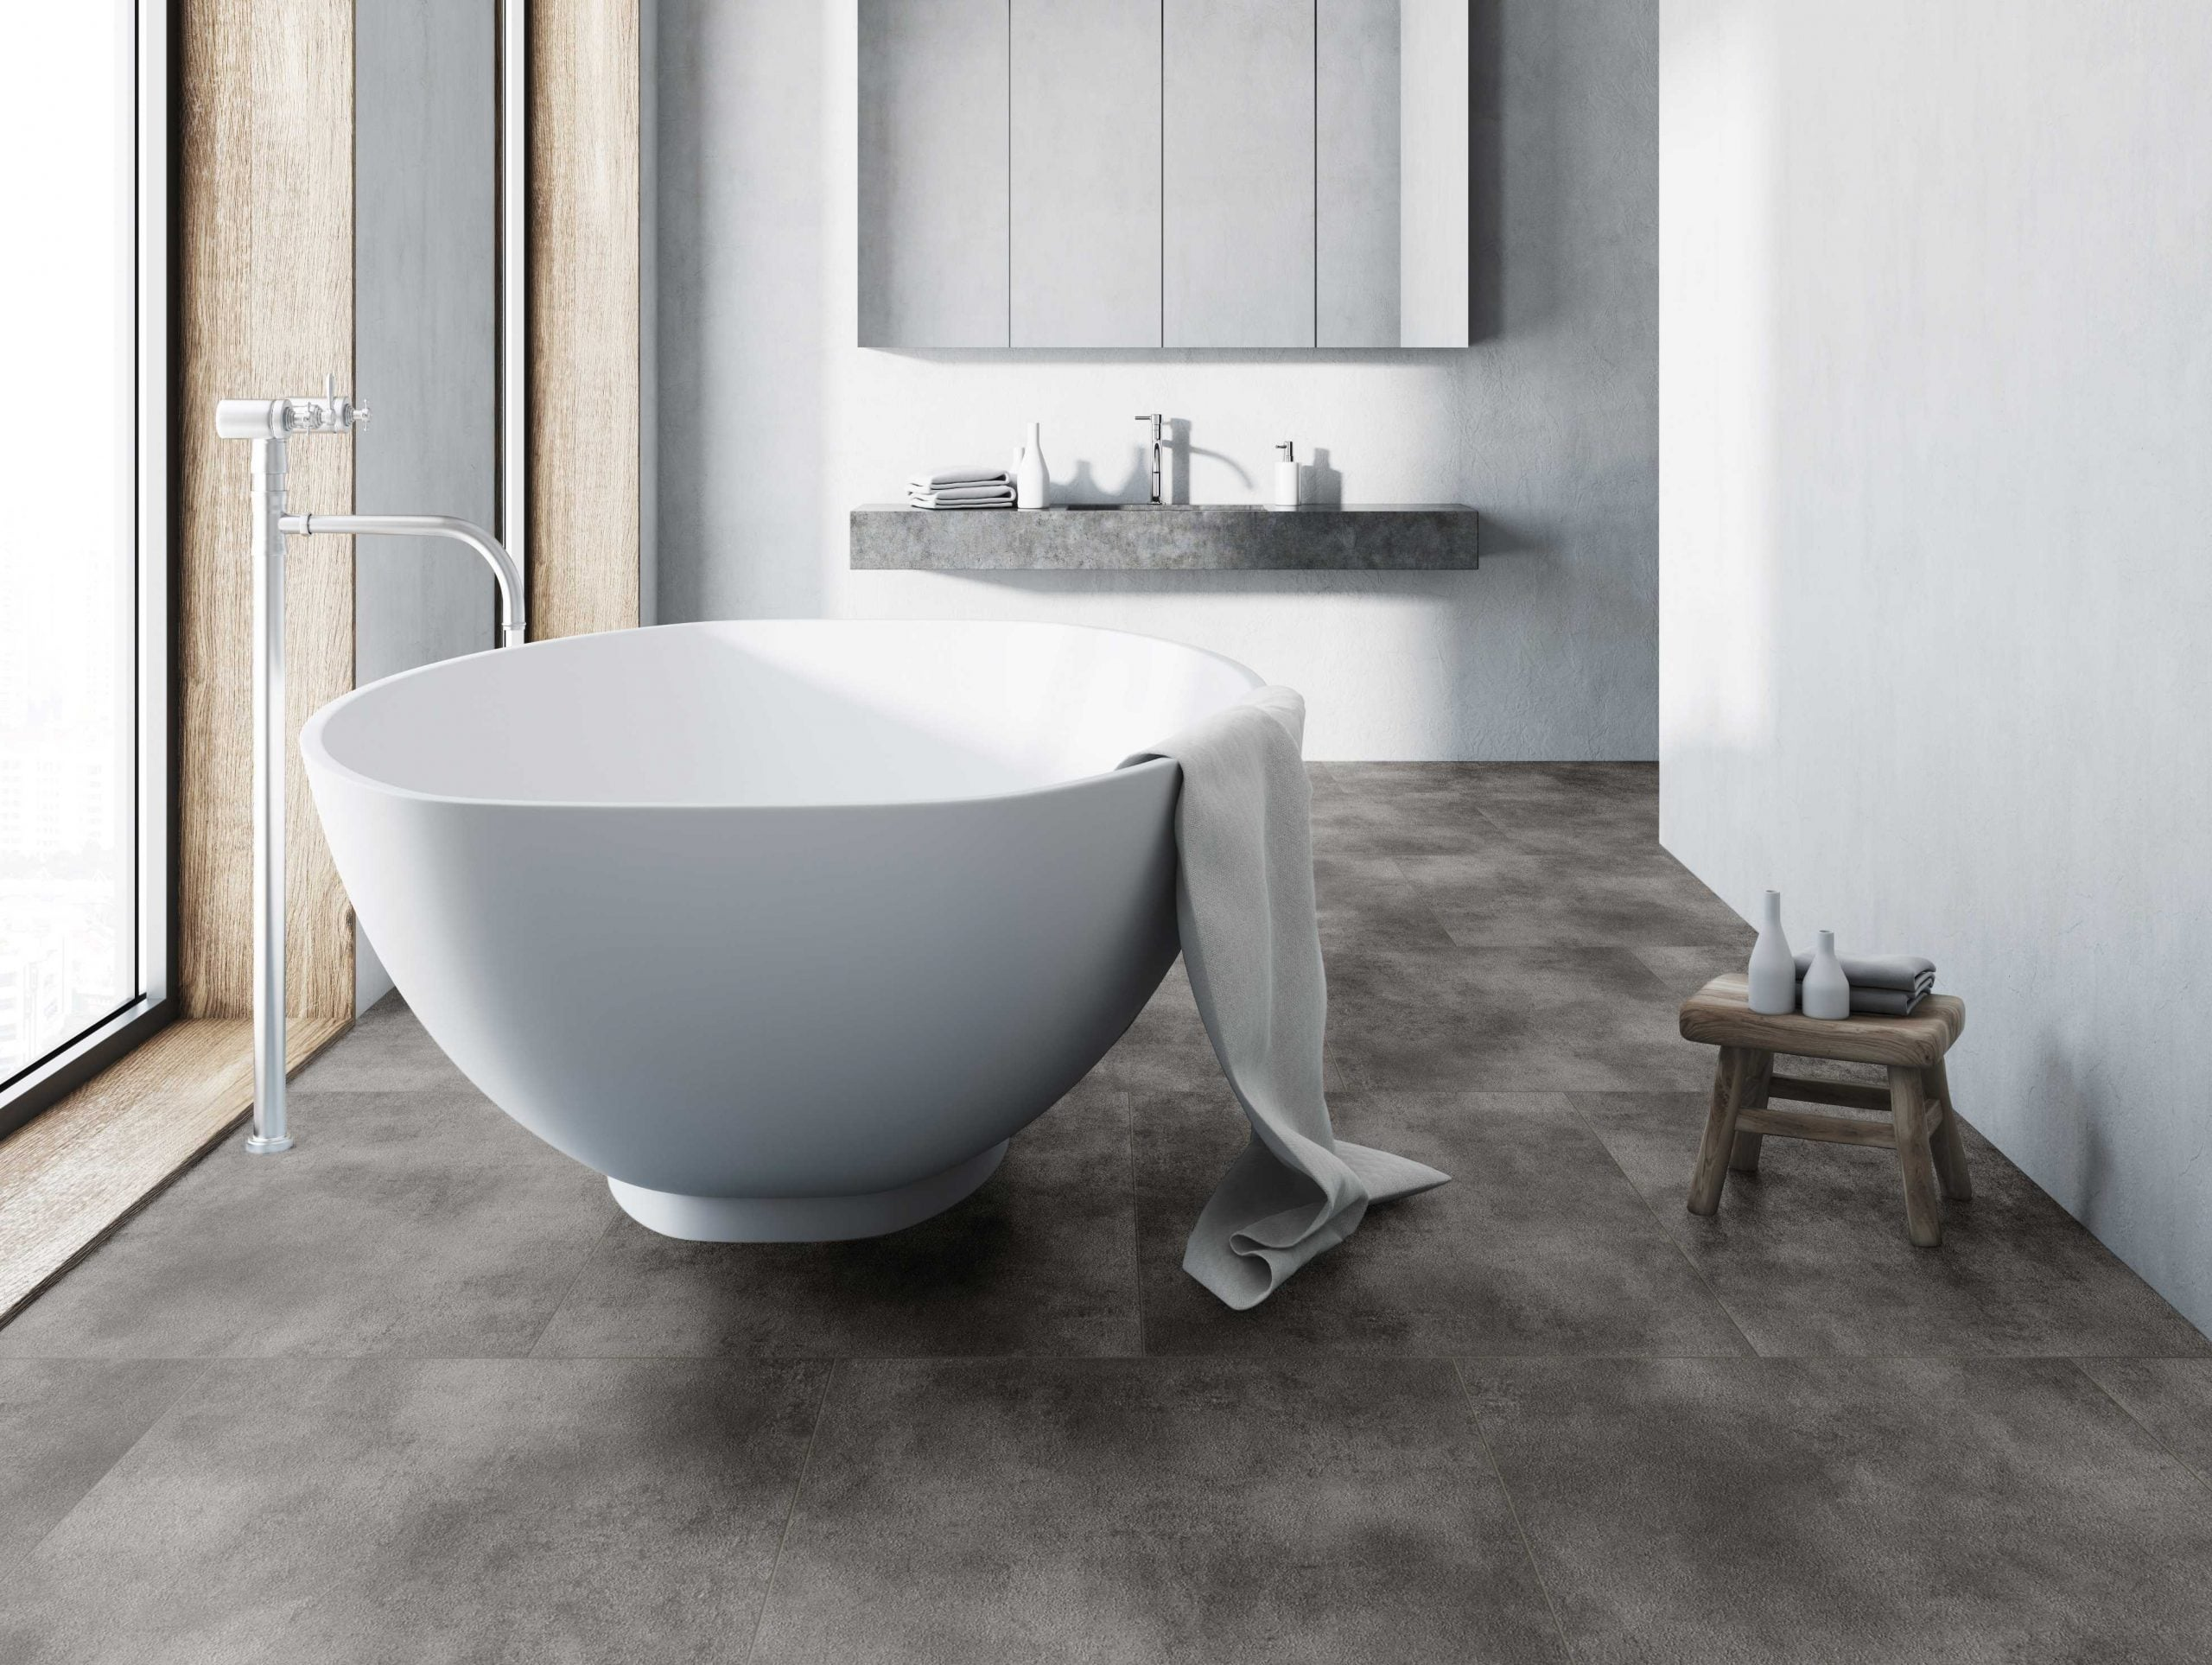 Rigid Core Tile 8800 Betonlook vloer Grey badkamer